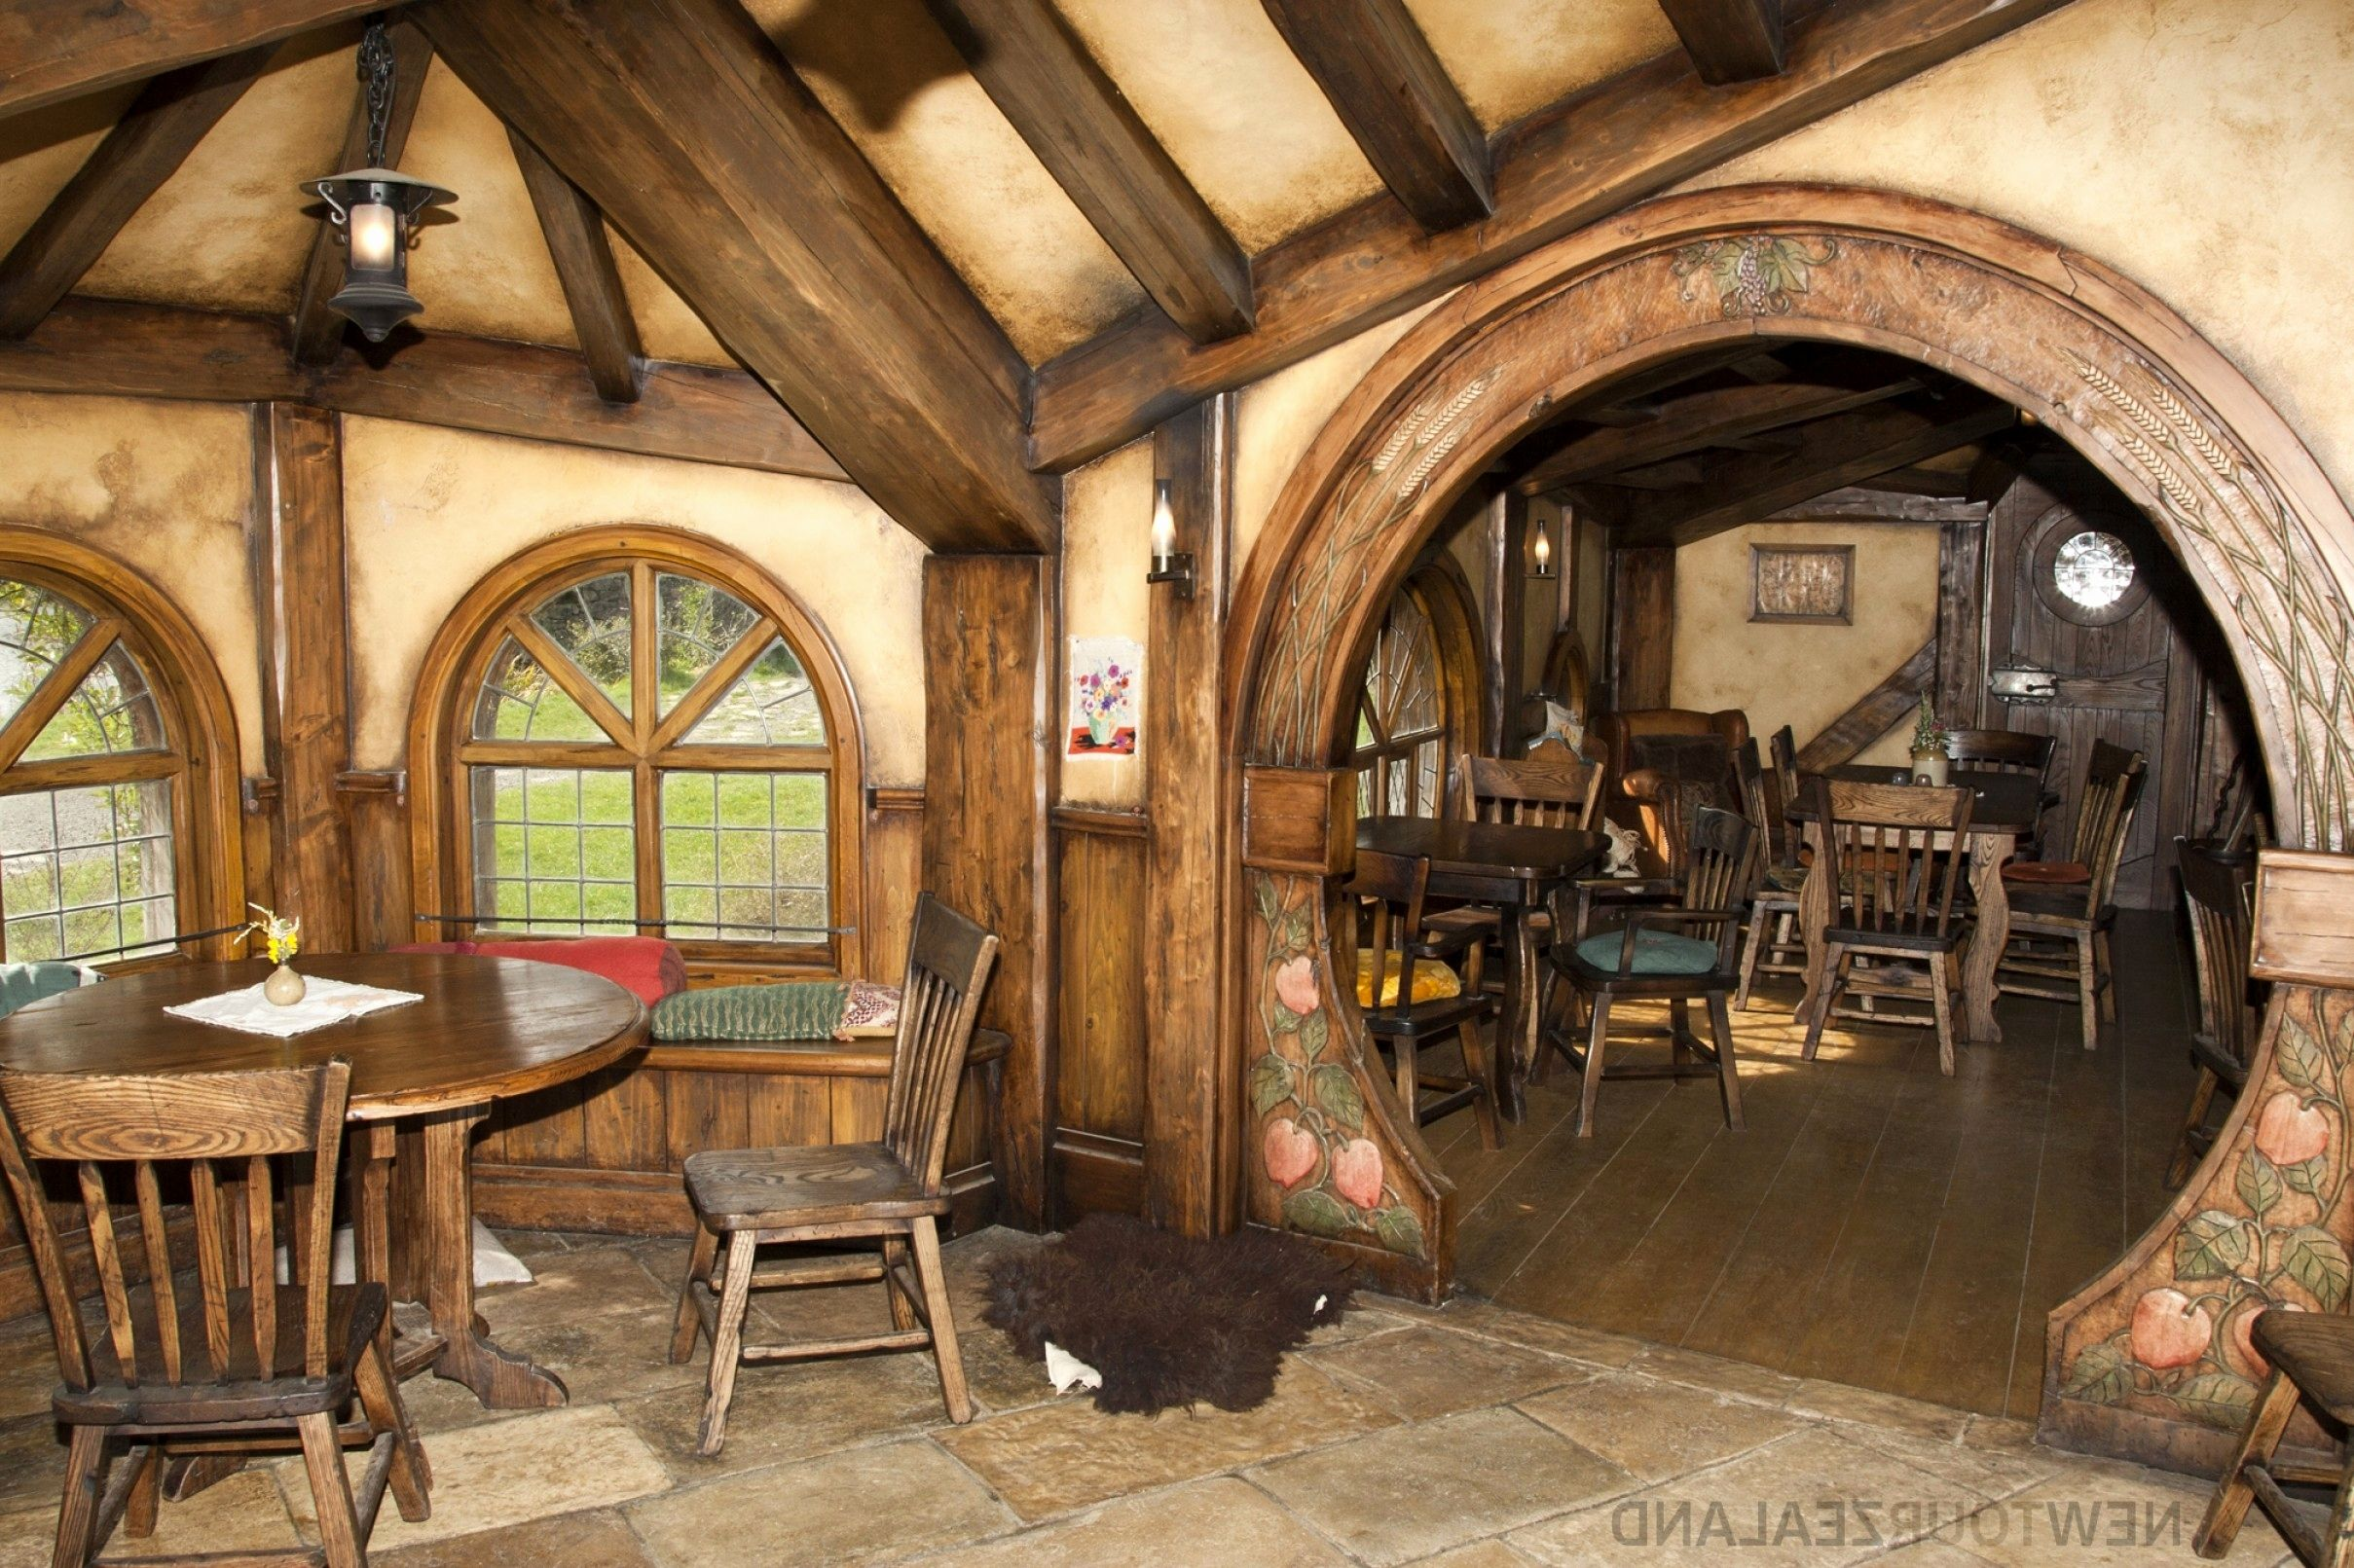 image result for hobbit house plans hobbit house ideas hobbit rh pinterest com hobbit hole house interior minecraft hobbit house interior